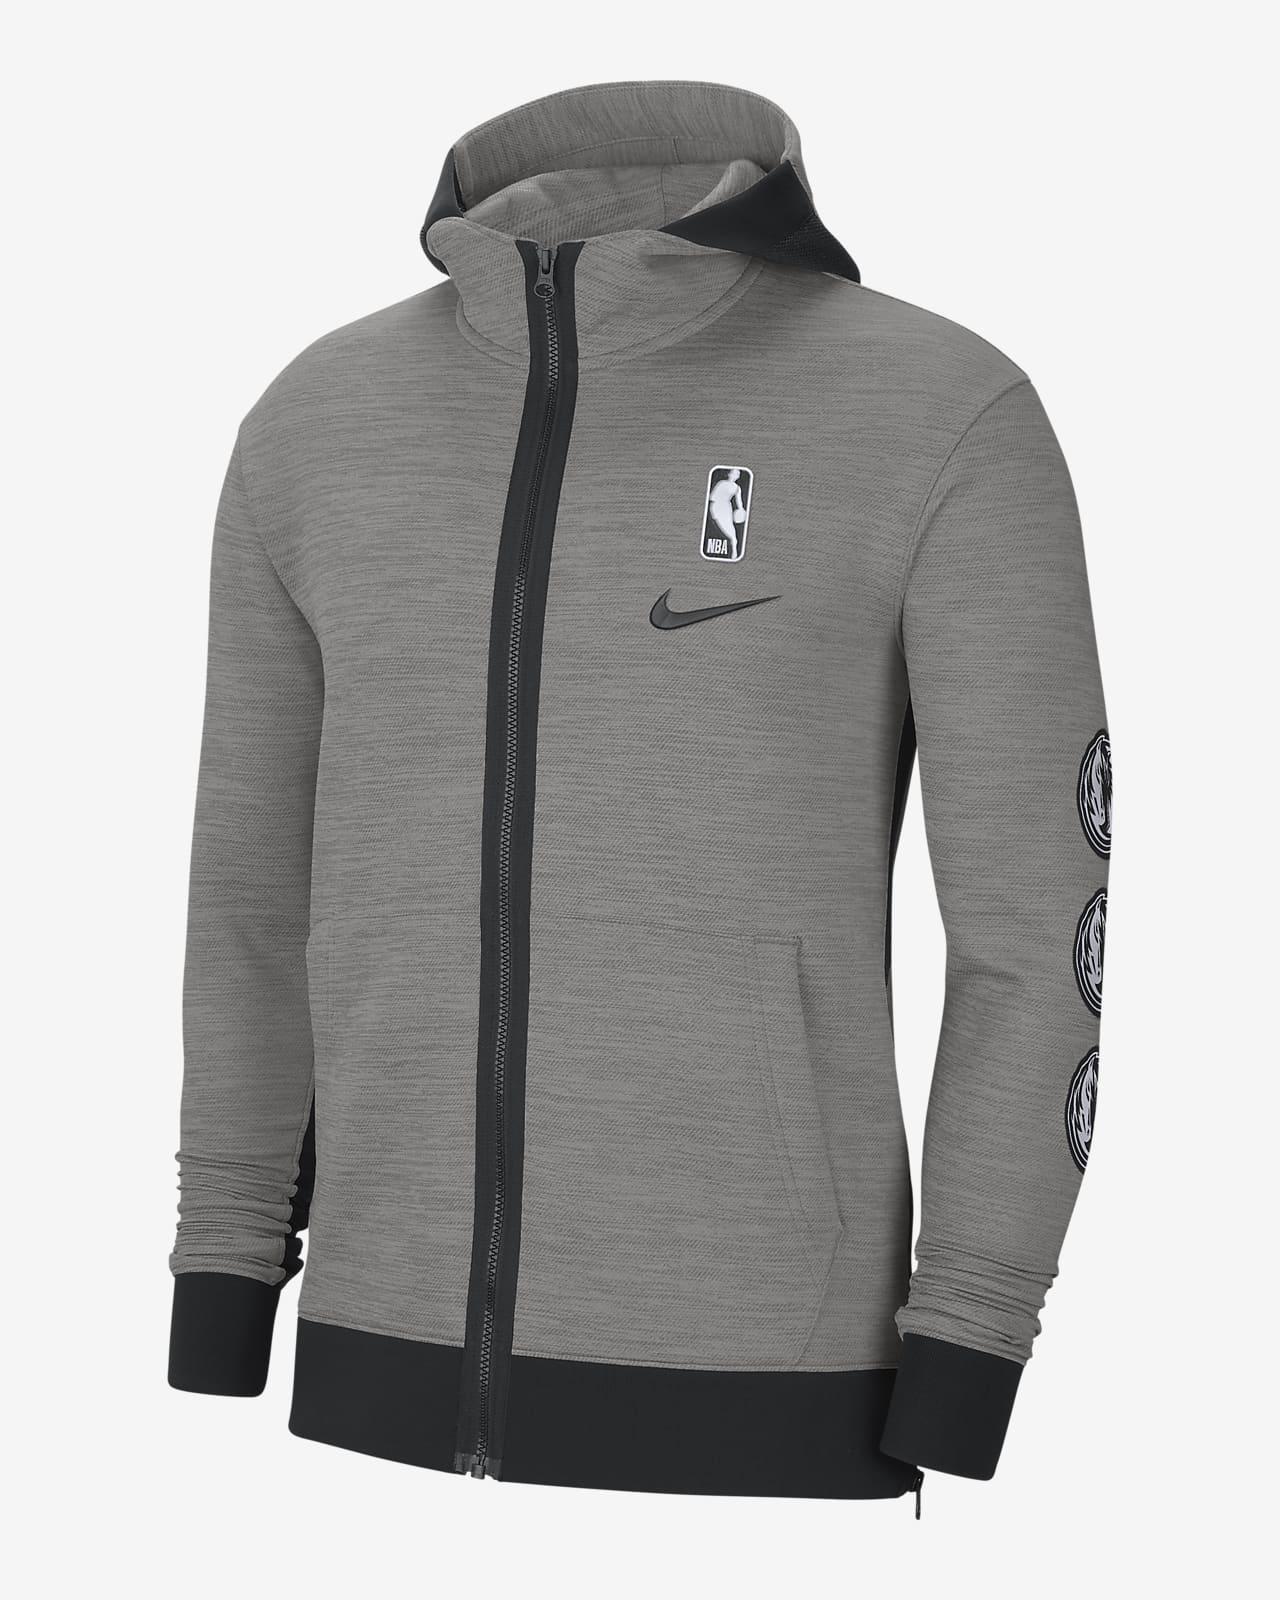 Mavericks Showtime Men's Nike Therma Flex NBA Hoodie